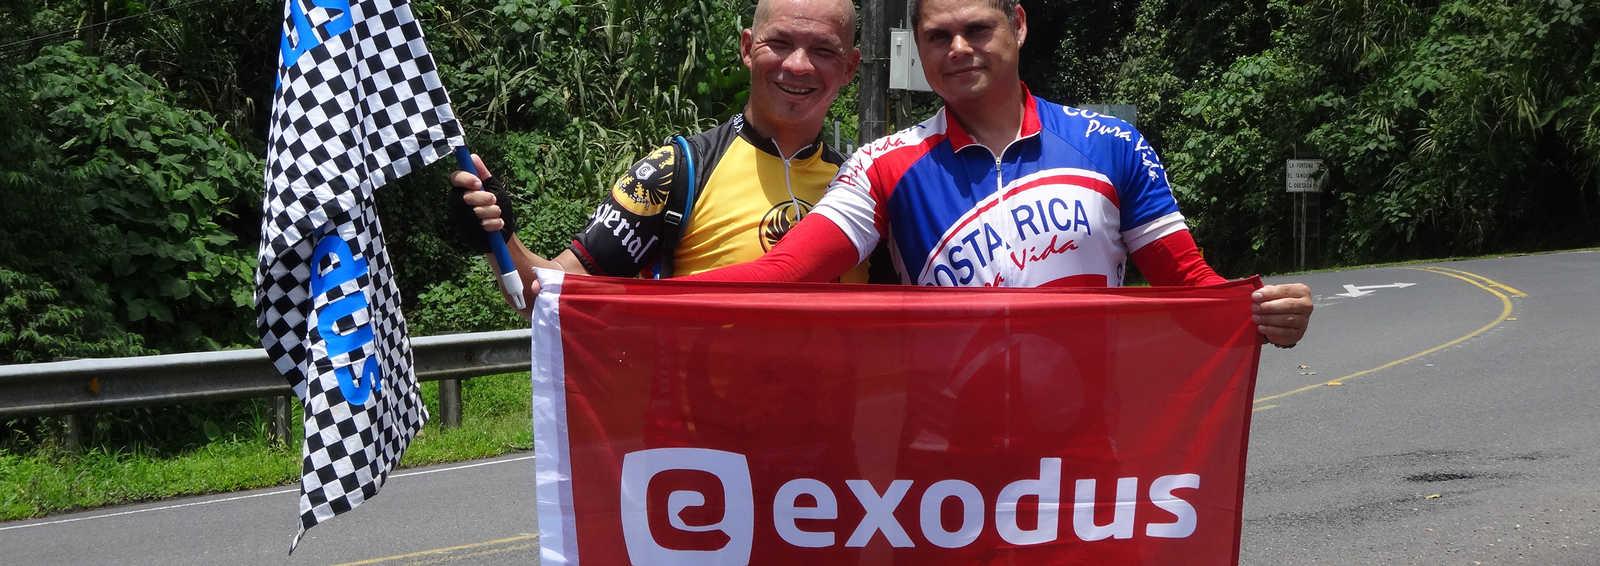 Winning team in Panama